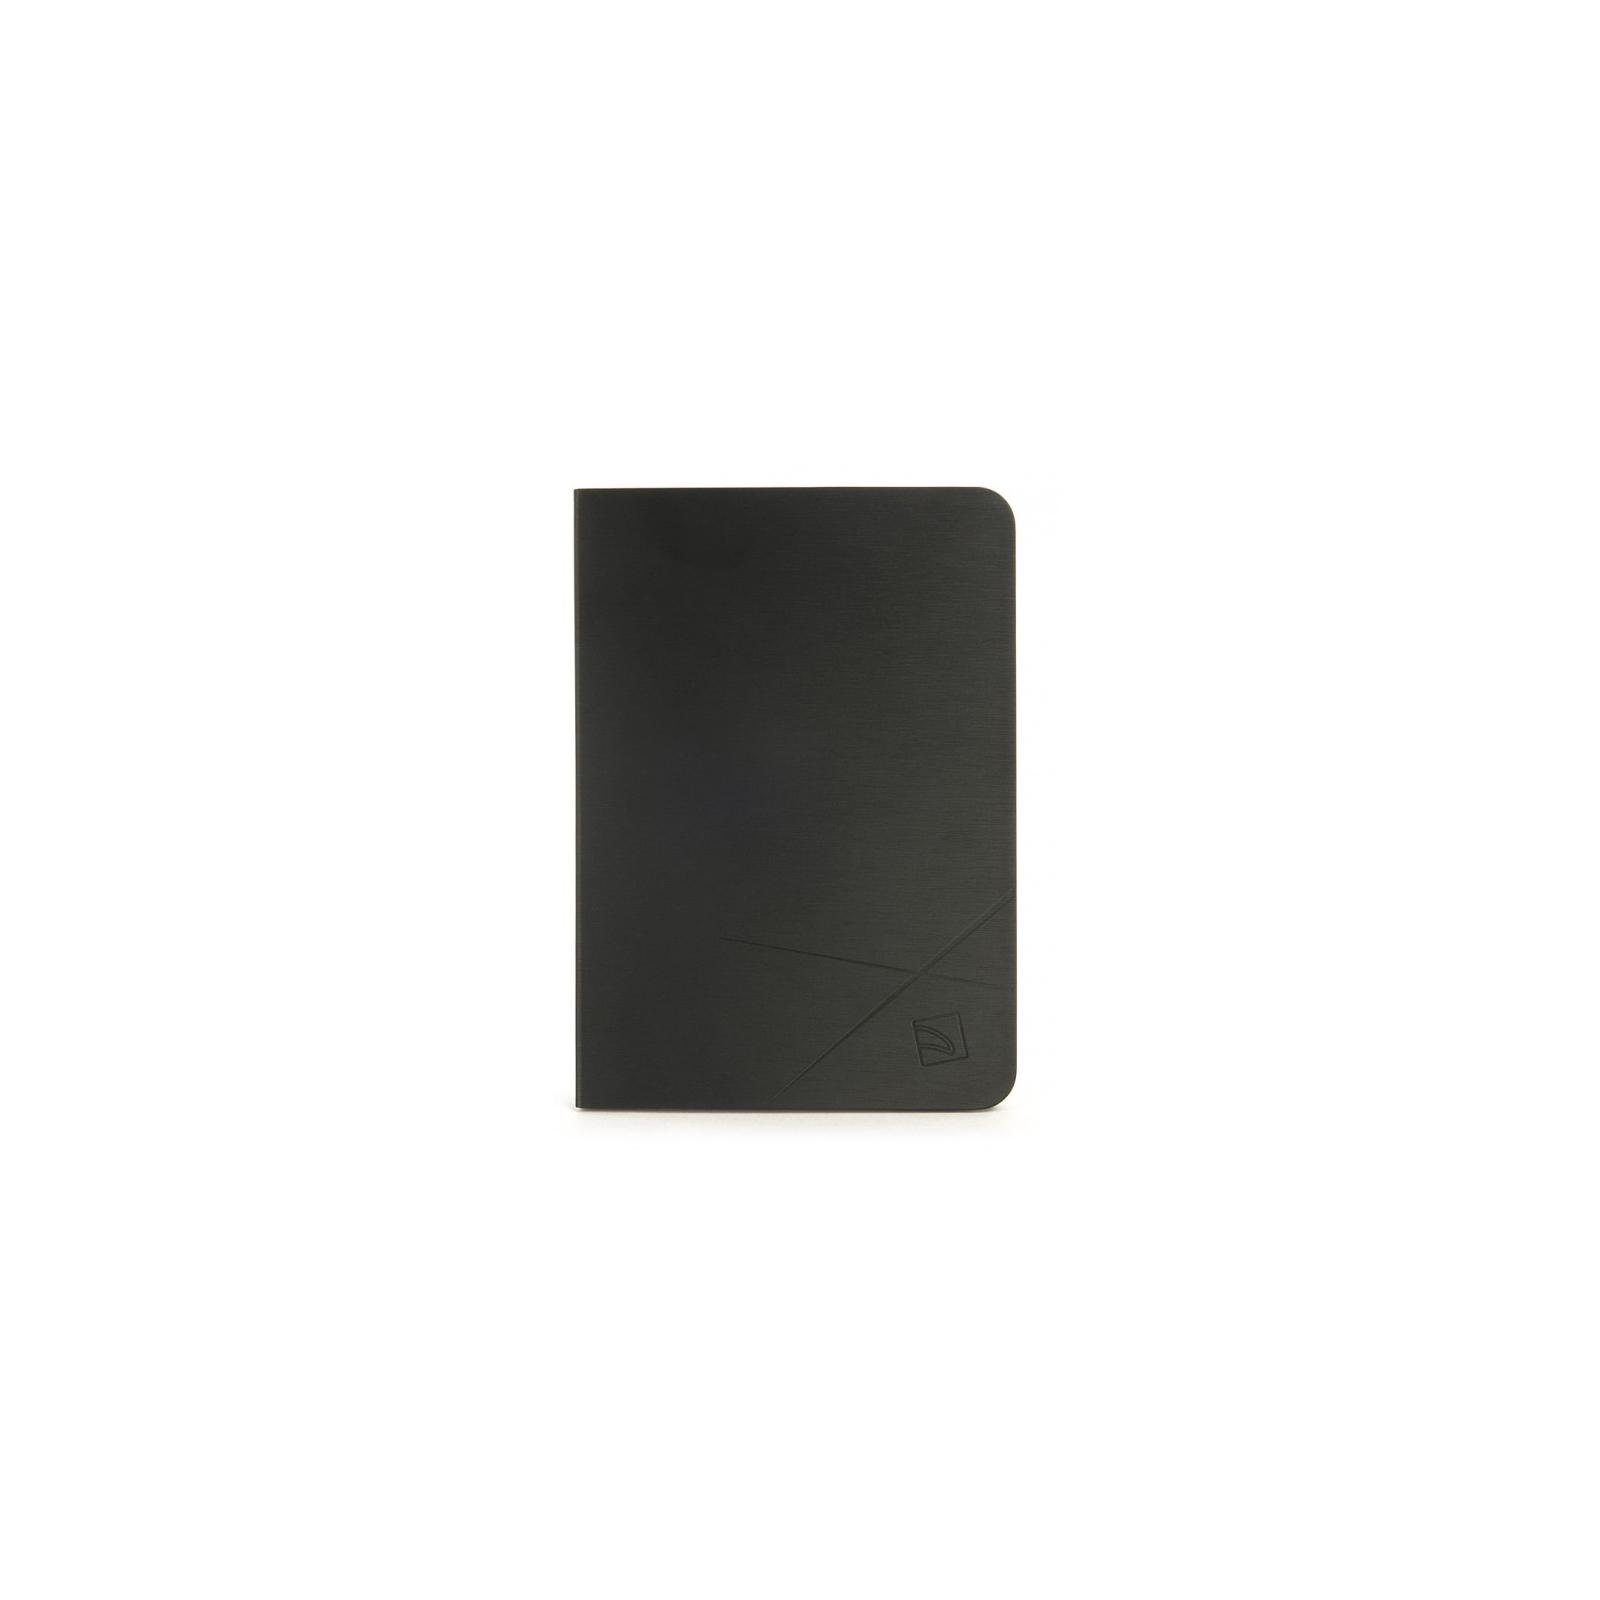 Чехол для планшета Tucano iPad Air Filo Black (IPD5FI)